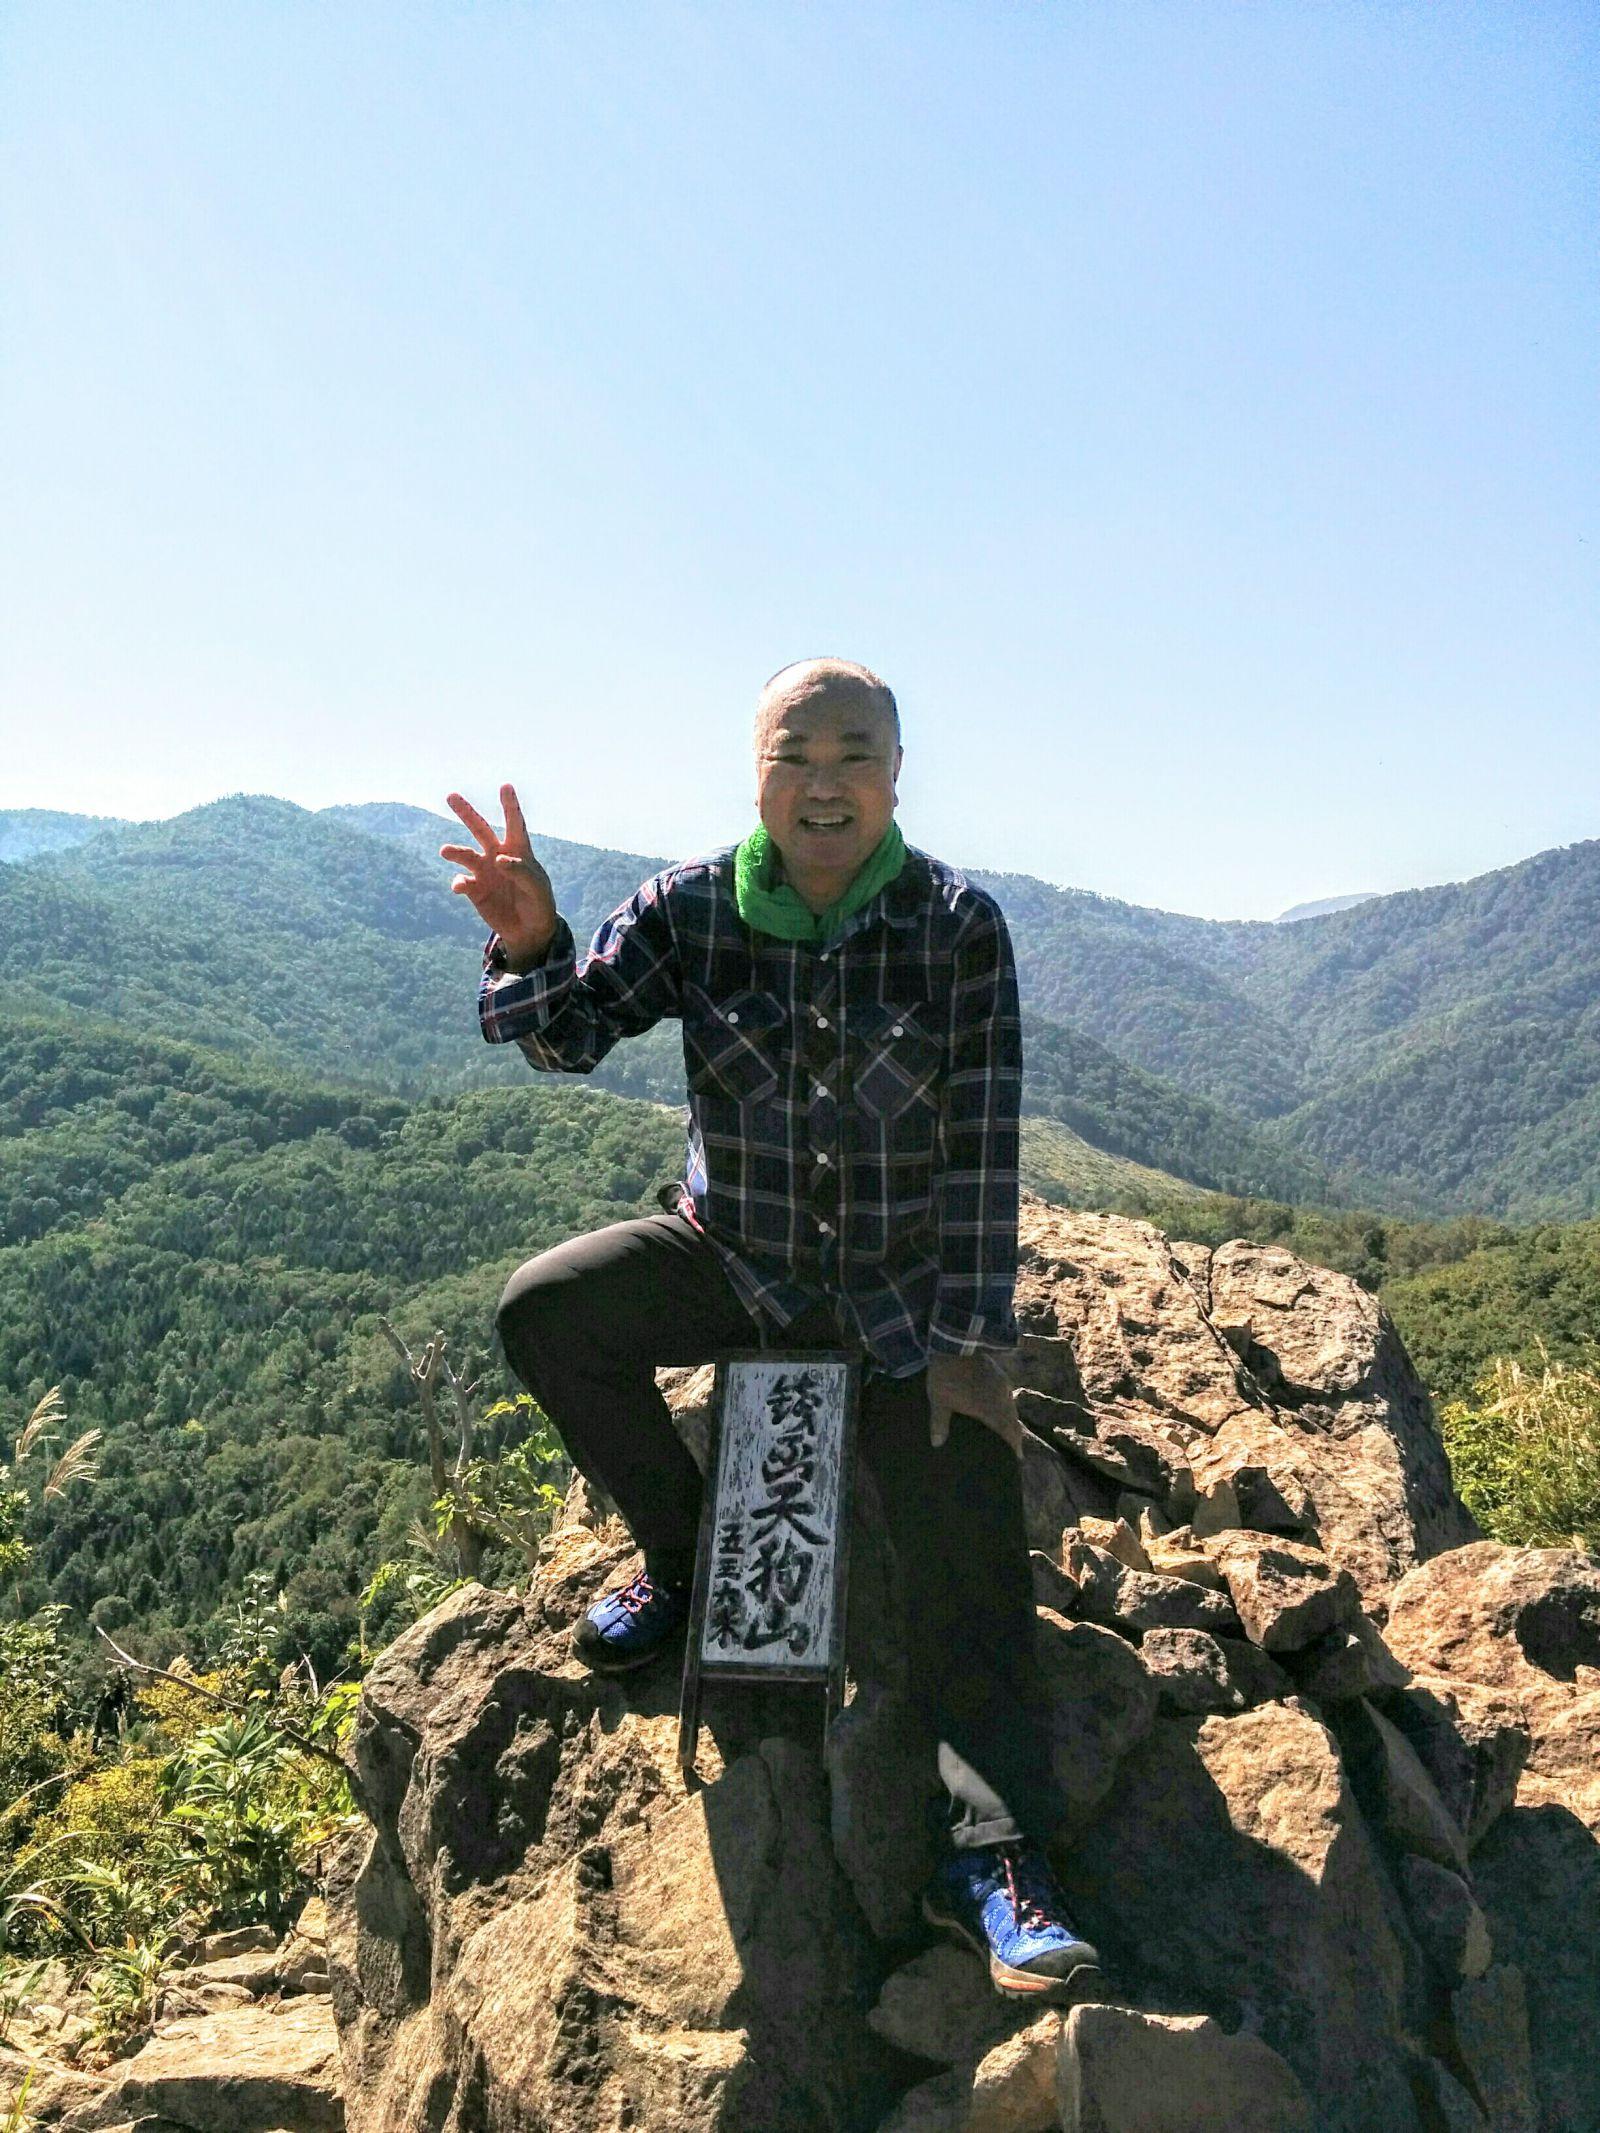 【小樽市】銭函天狗山登山観光案内です。